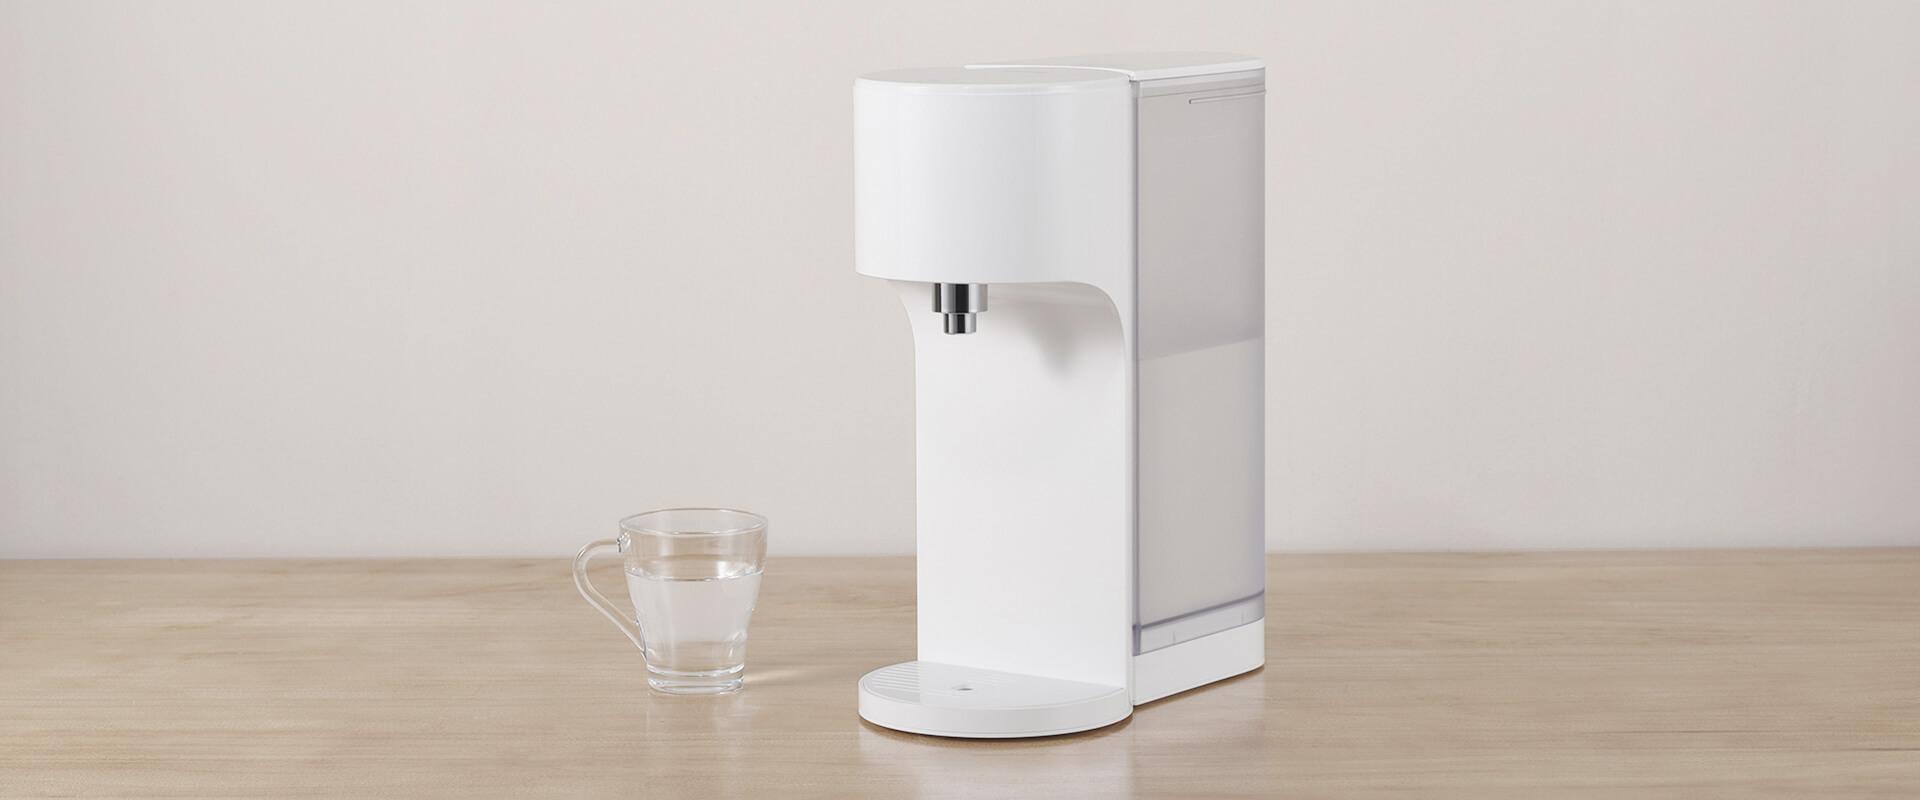 kitchen instant hot water